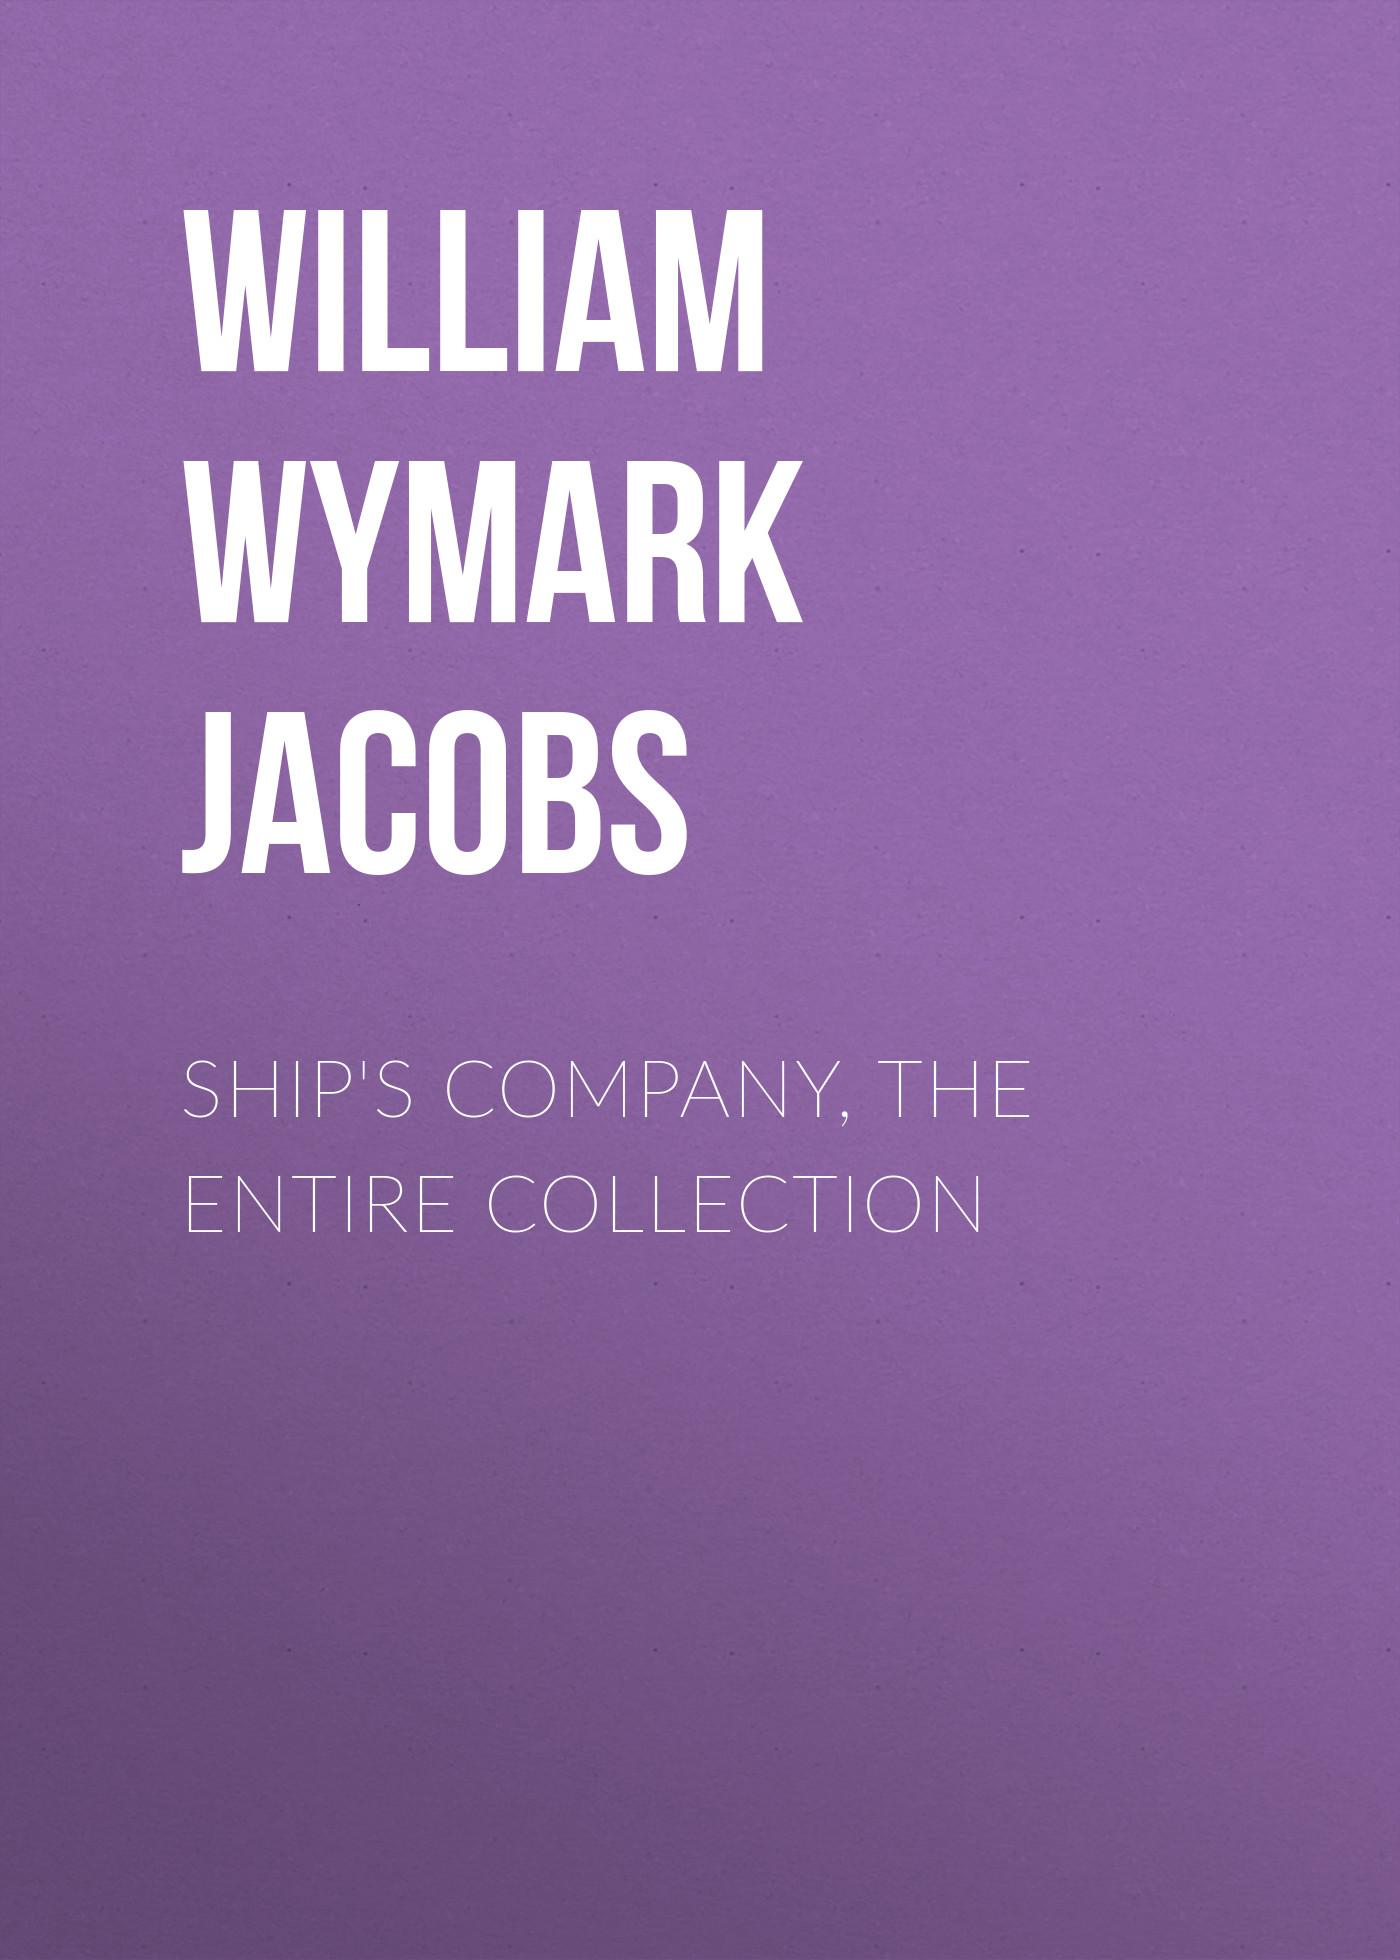 William Wymark Jacobs Ship's Company, the Entire Collection william wymark jacobs over the side